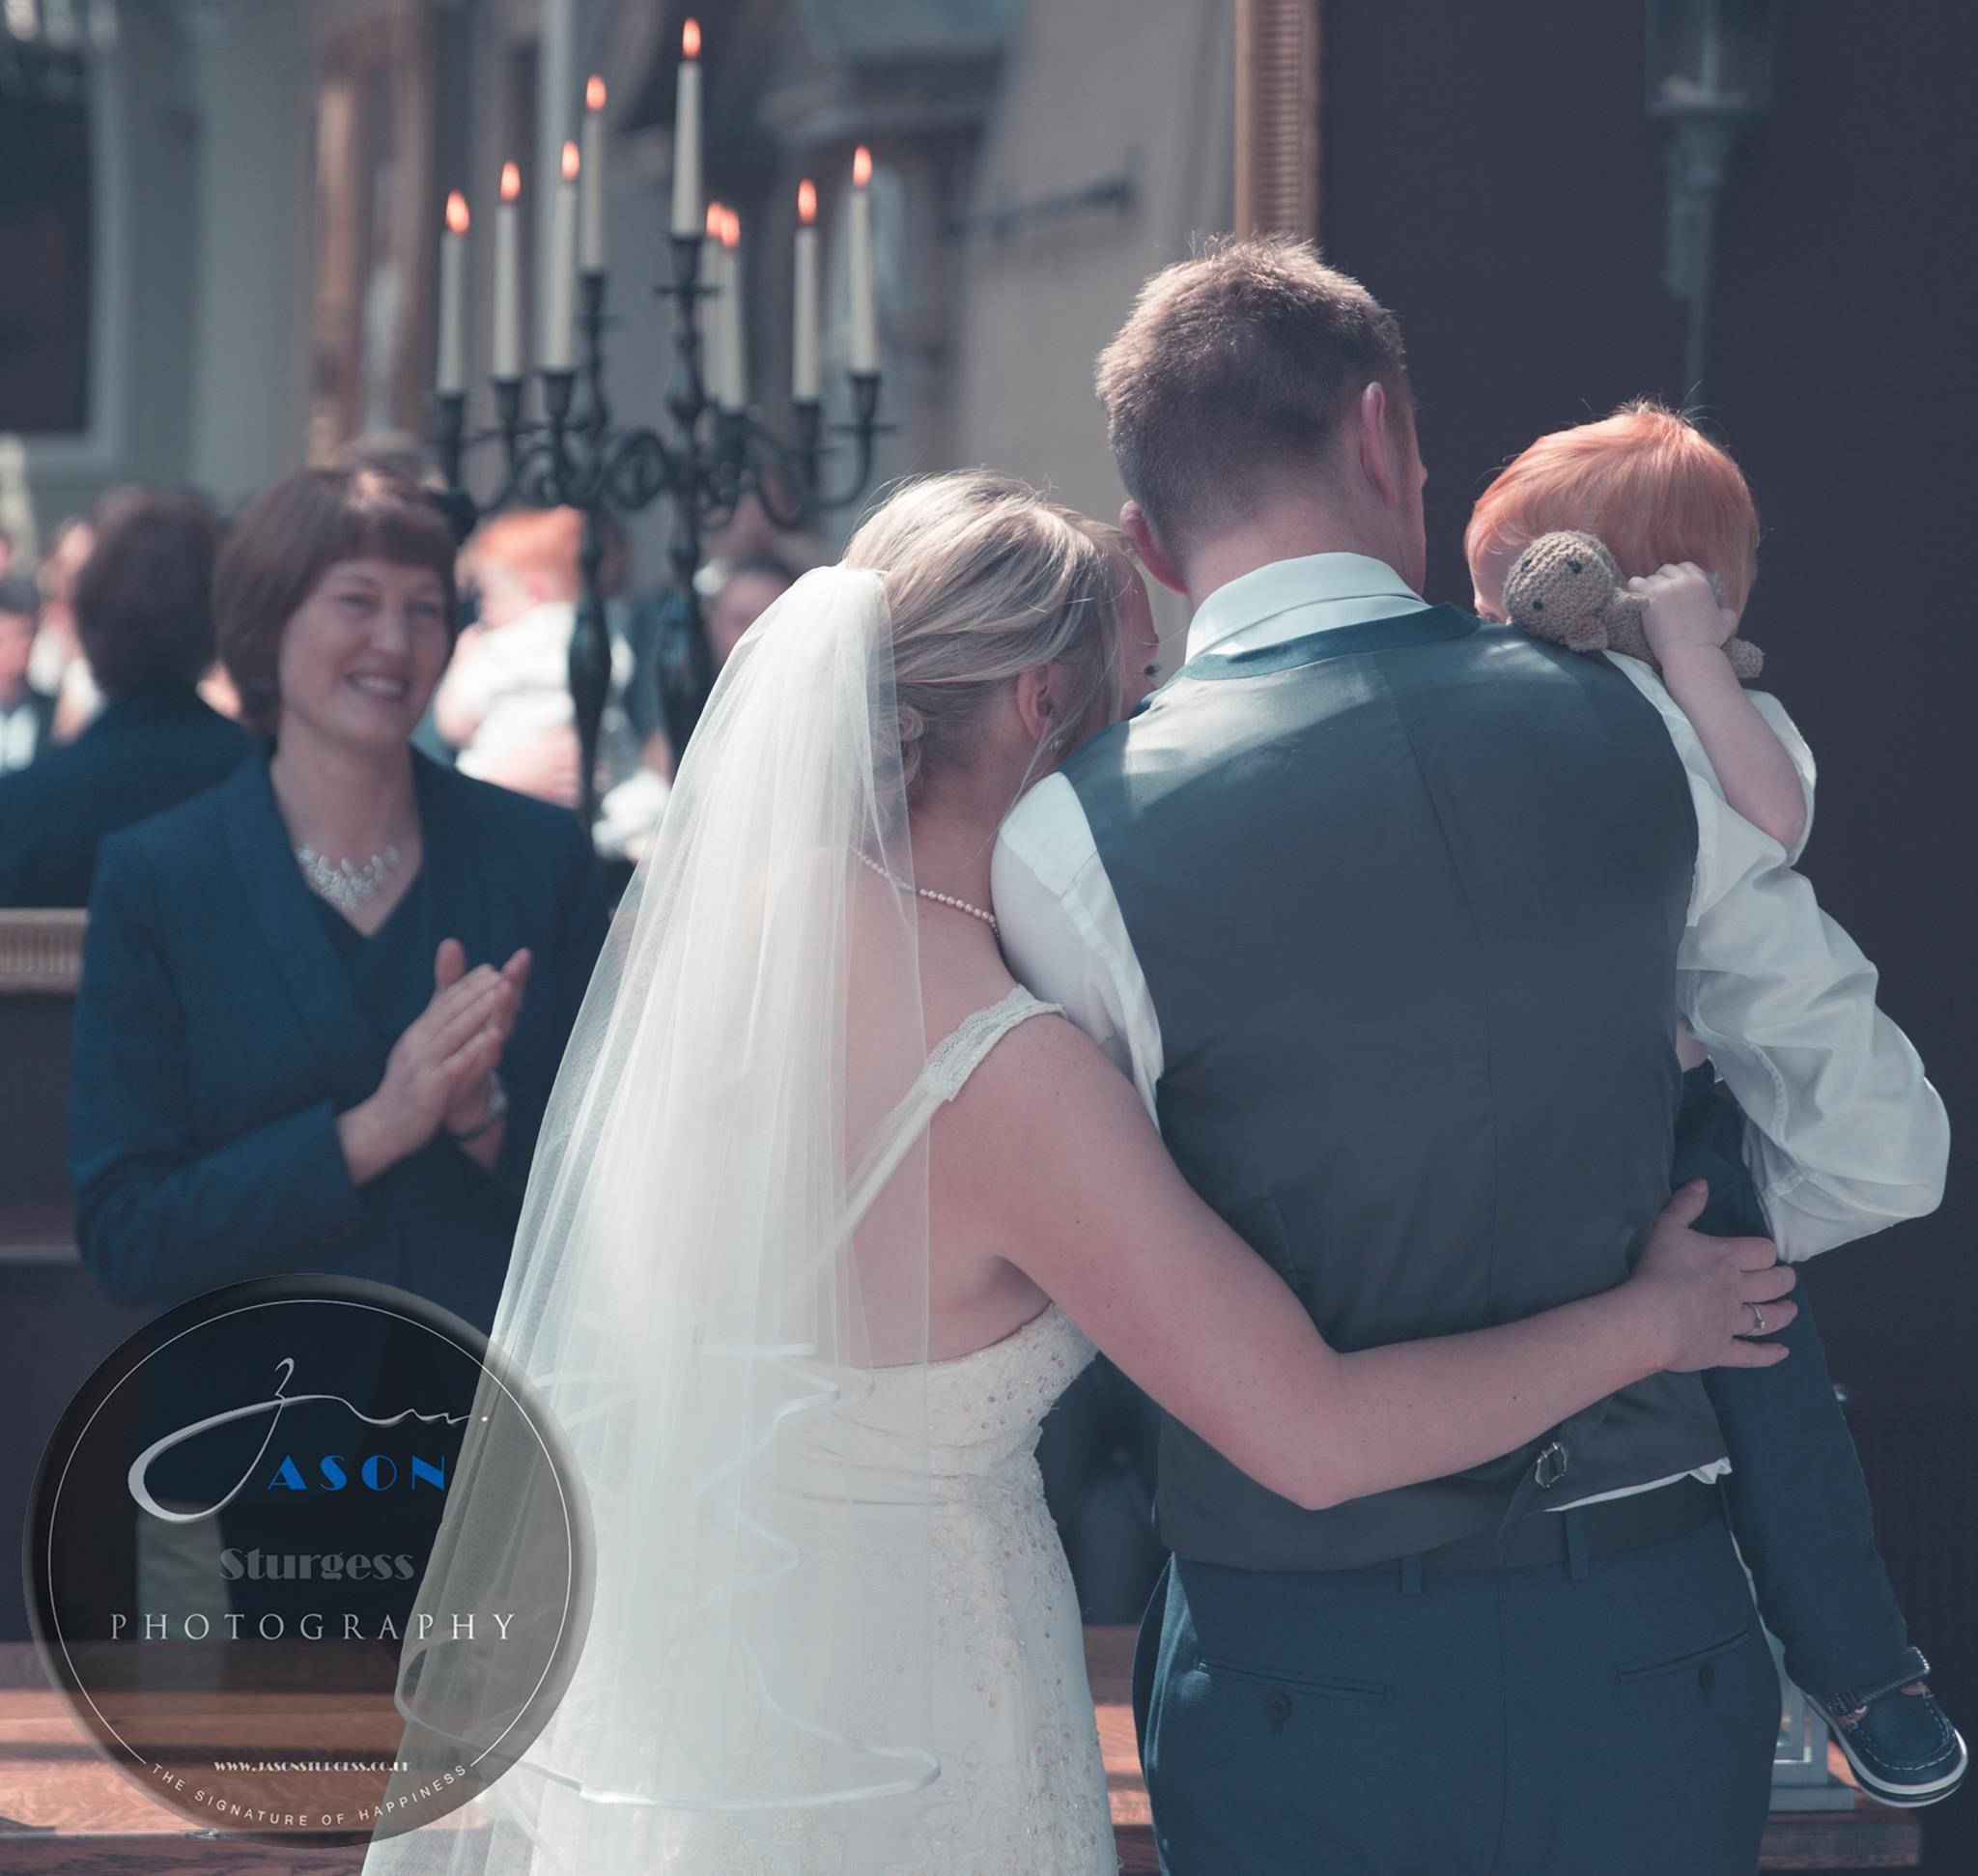 Manor #Hotel #Yeovil #Wedding #Family | Jason Sturgess Photography ...